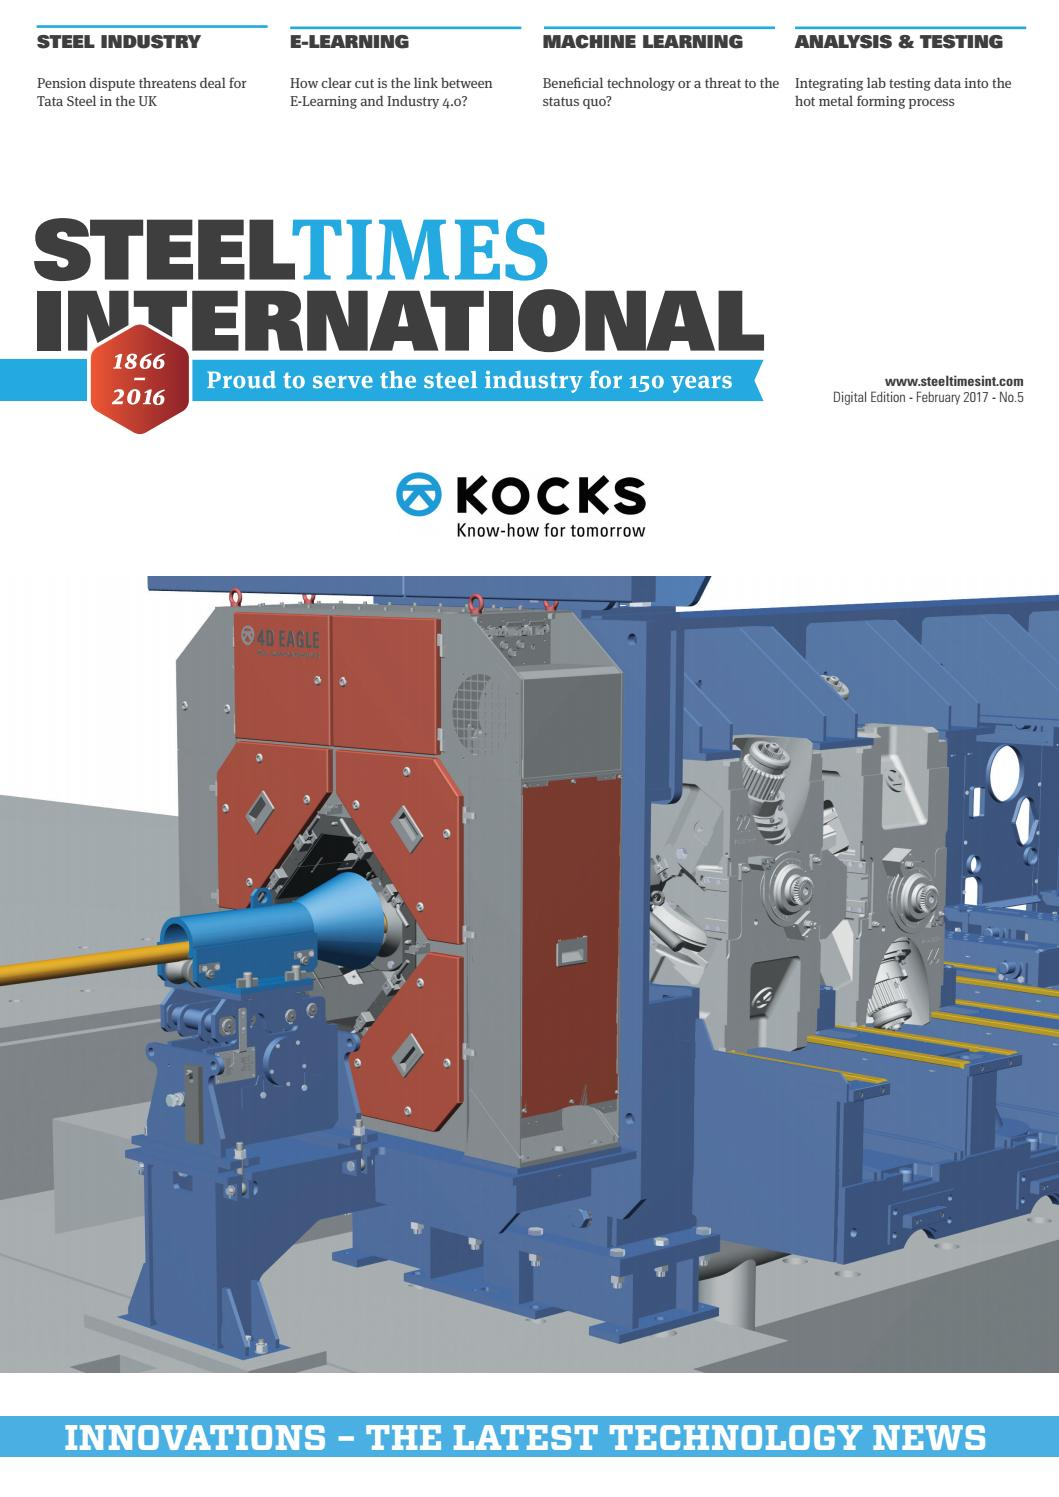 Steel Times International Digital February 2017 by Quartz